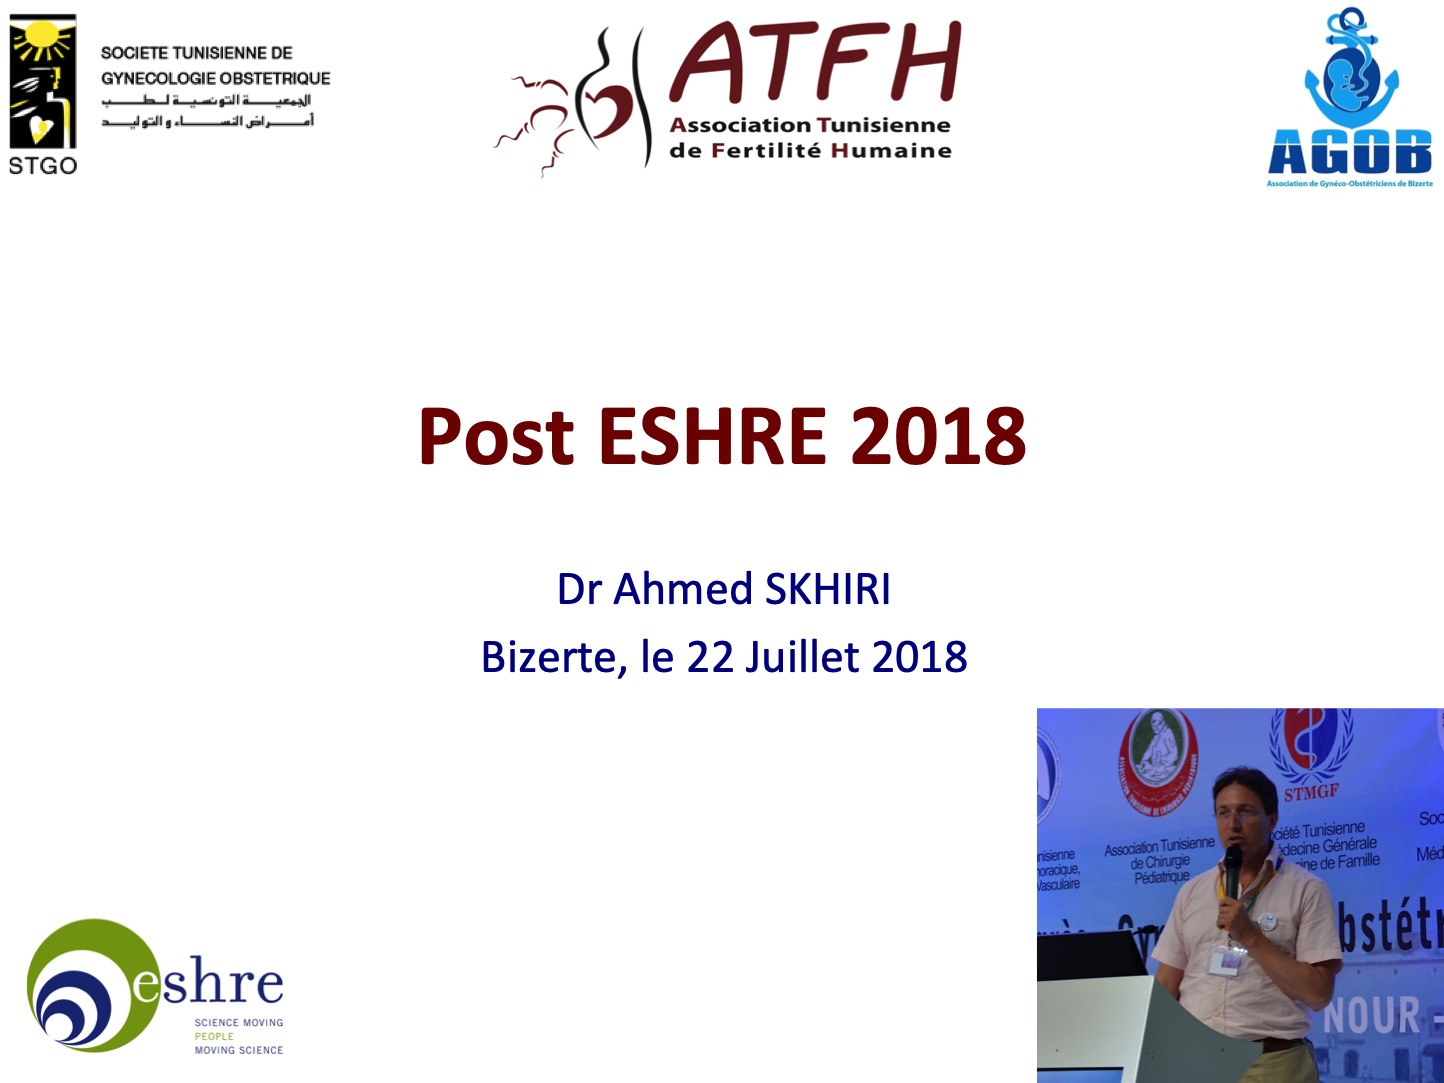 Post ESHRE 22-07-2018 AGOB Affiche Dr SKHIRI